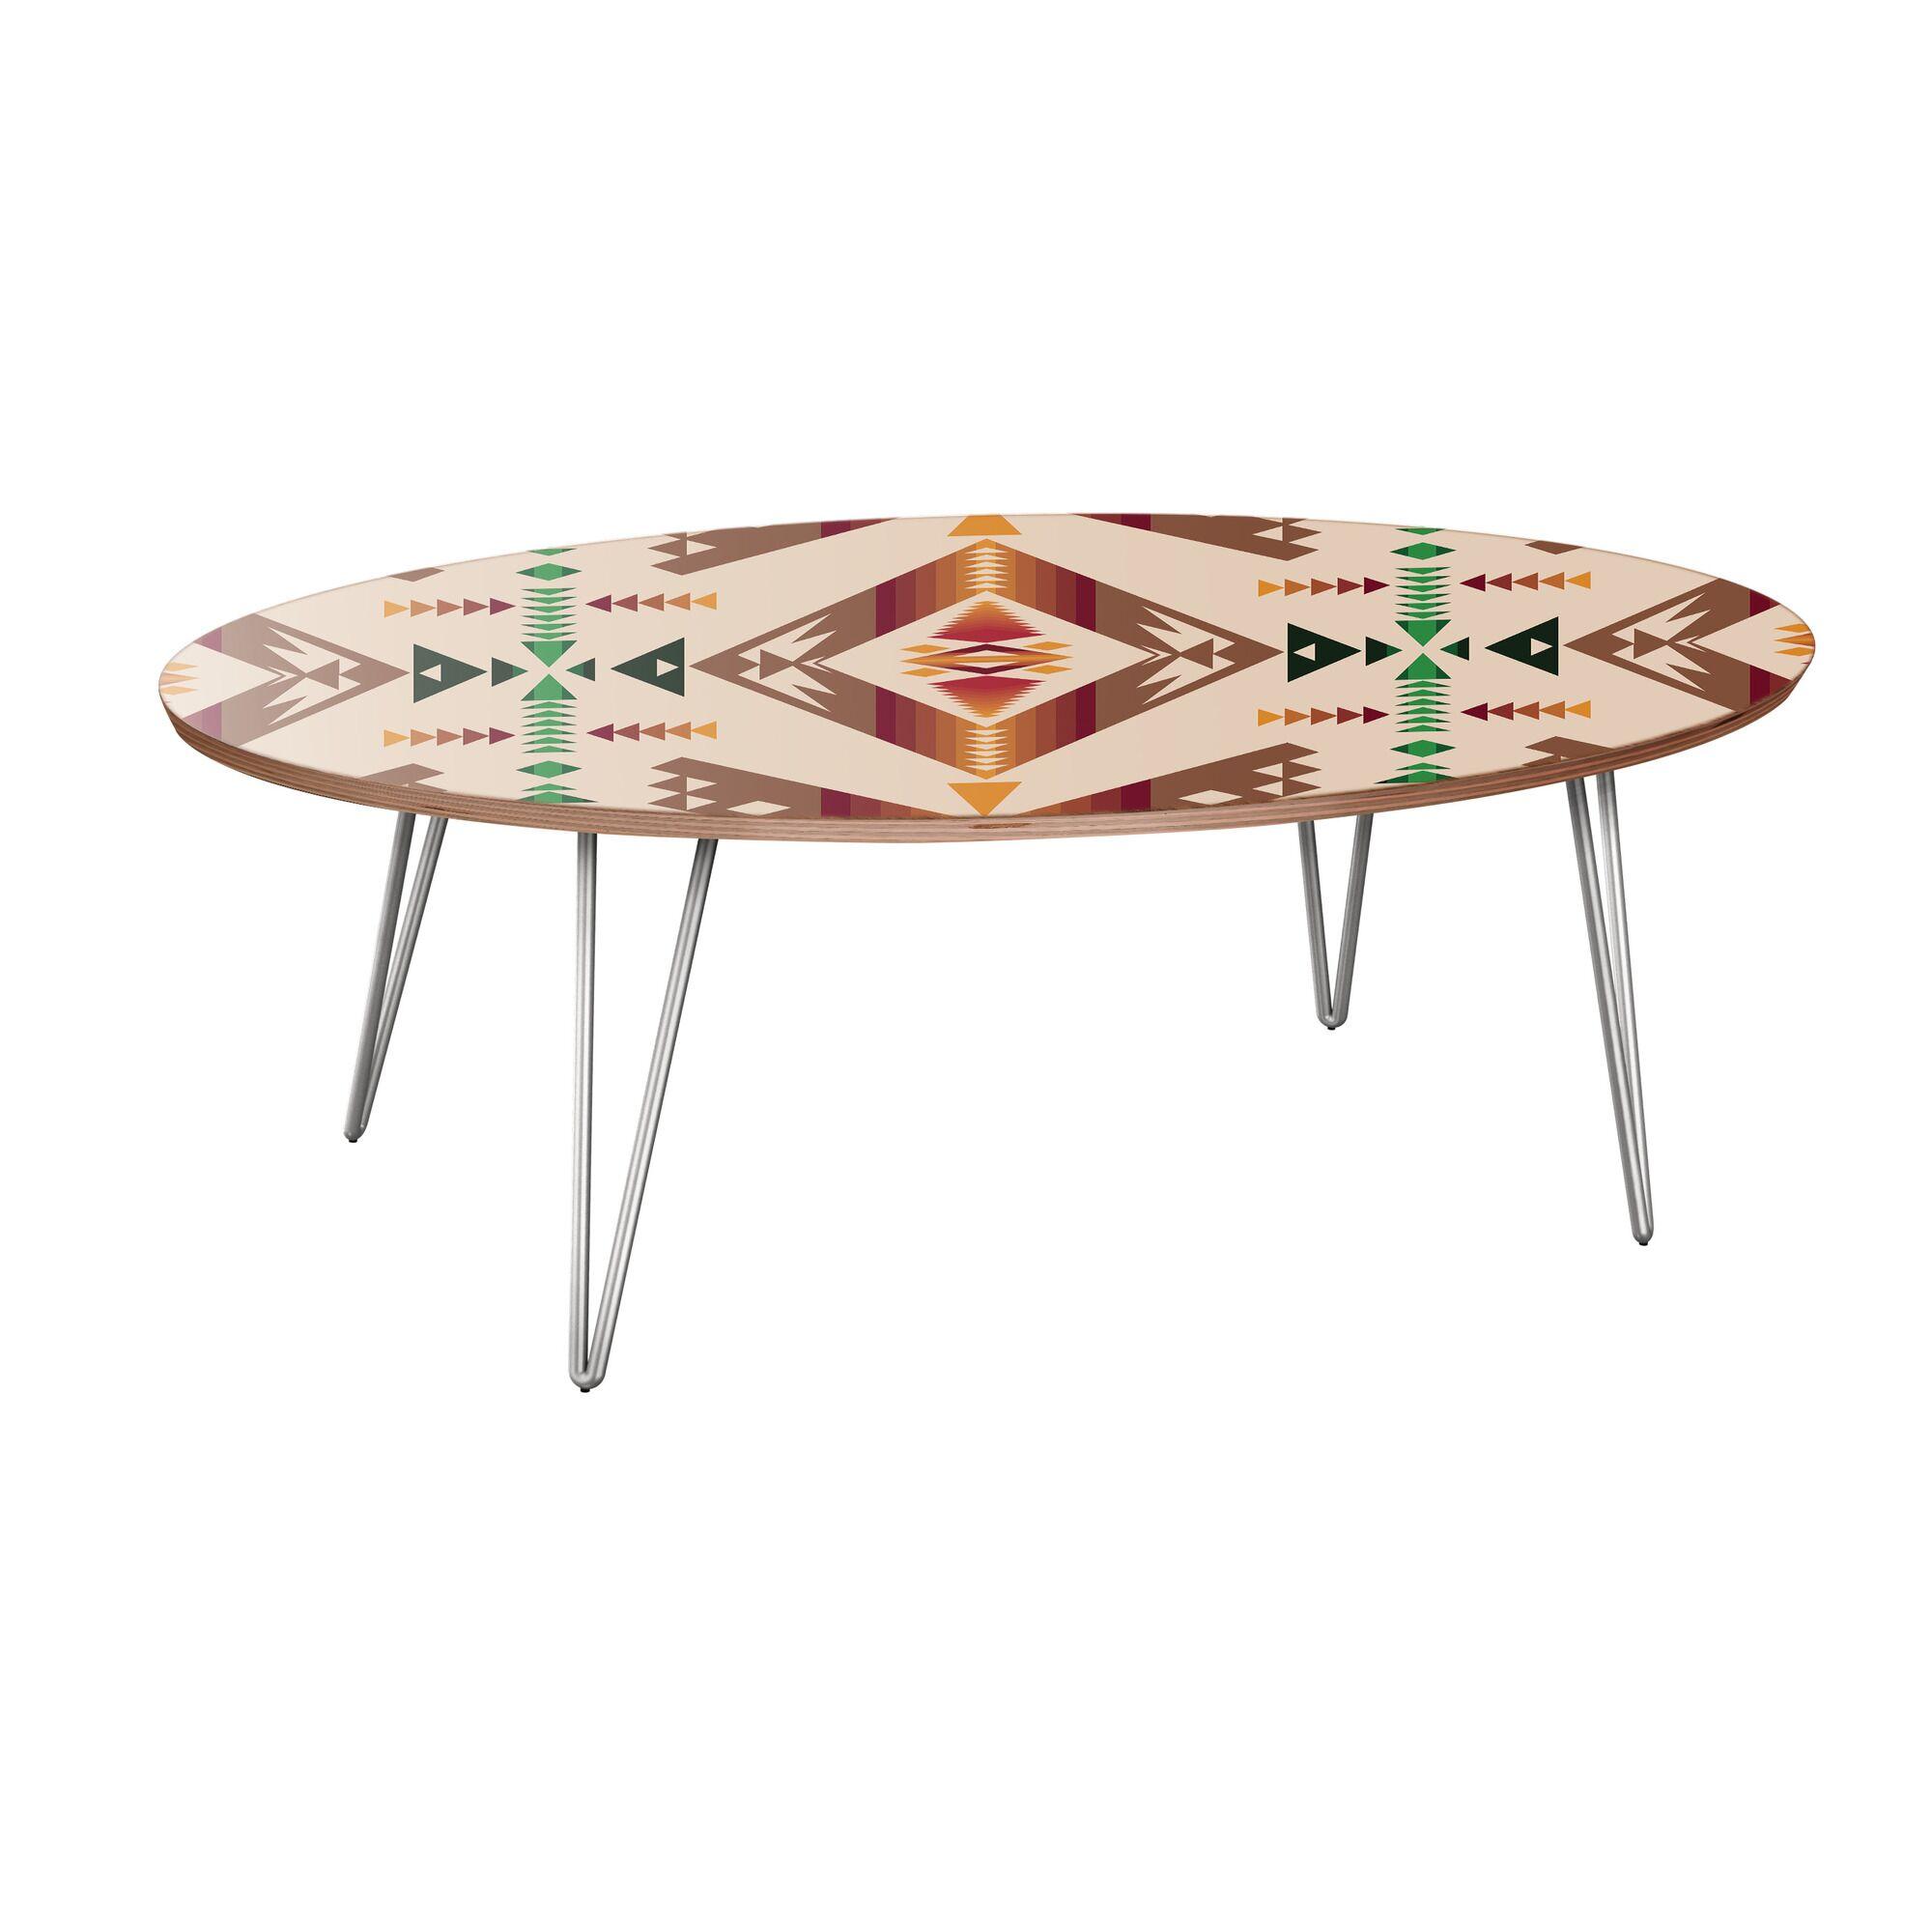 Howlett Coffee Table Table Base Color: Chrome, Table Top Color: Walnut